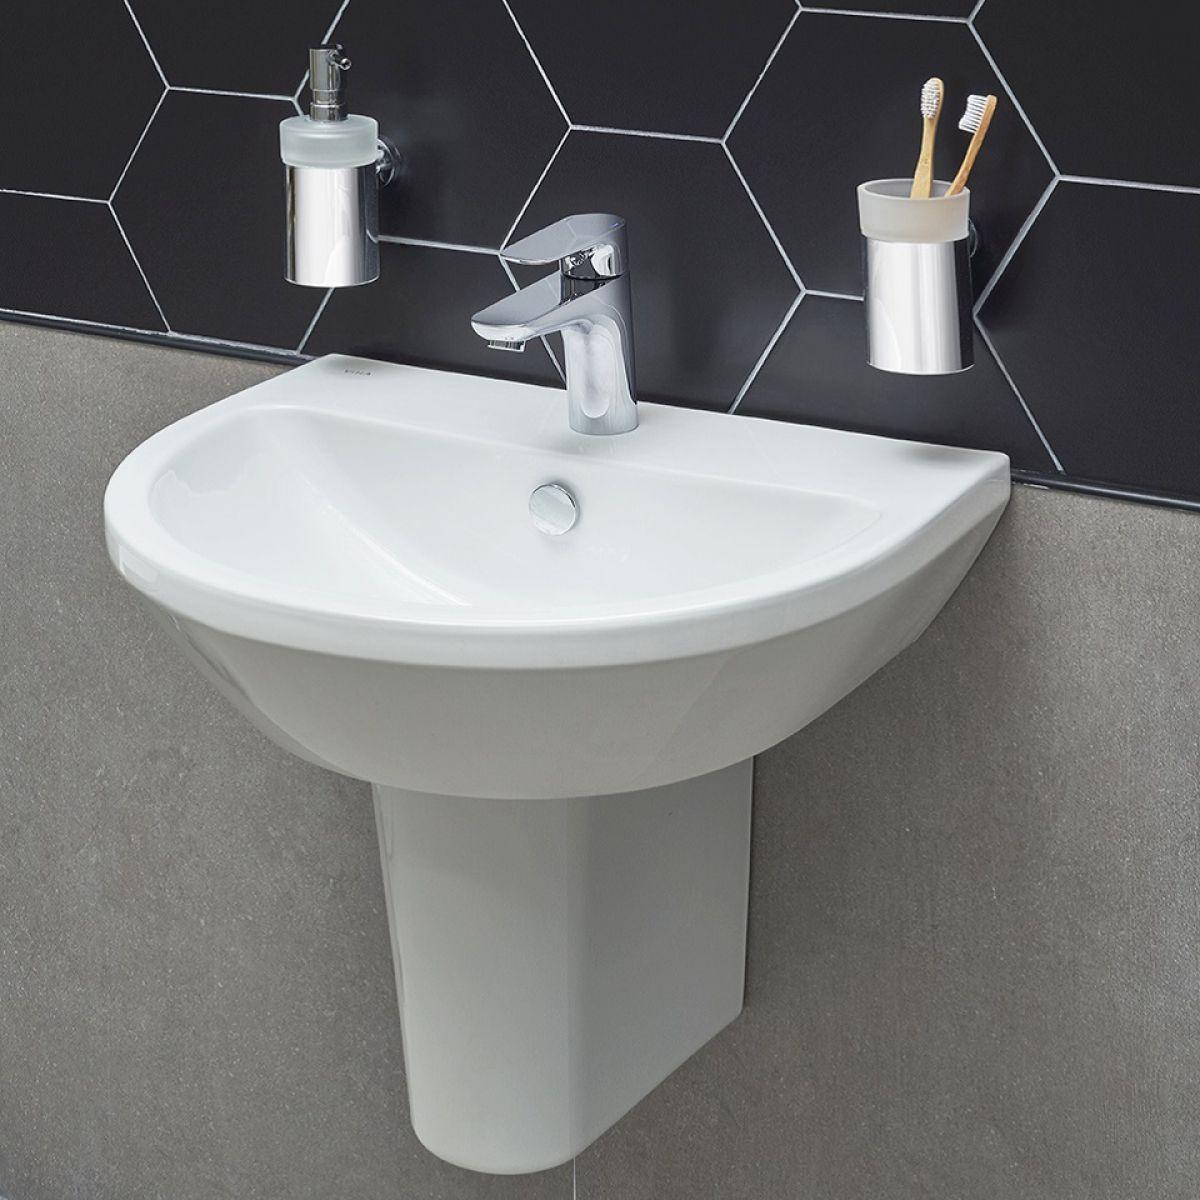 Vitra Integra Round Cloakroom Basin Uk Bathrooms